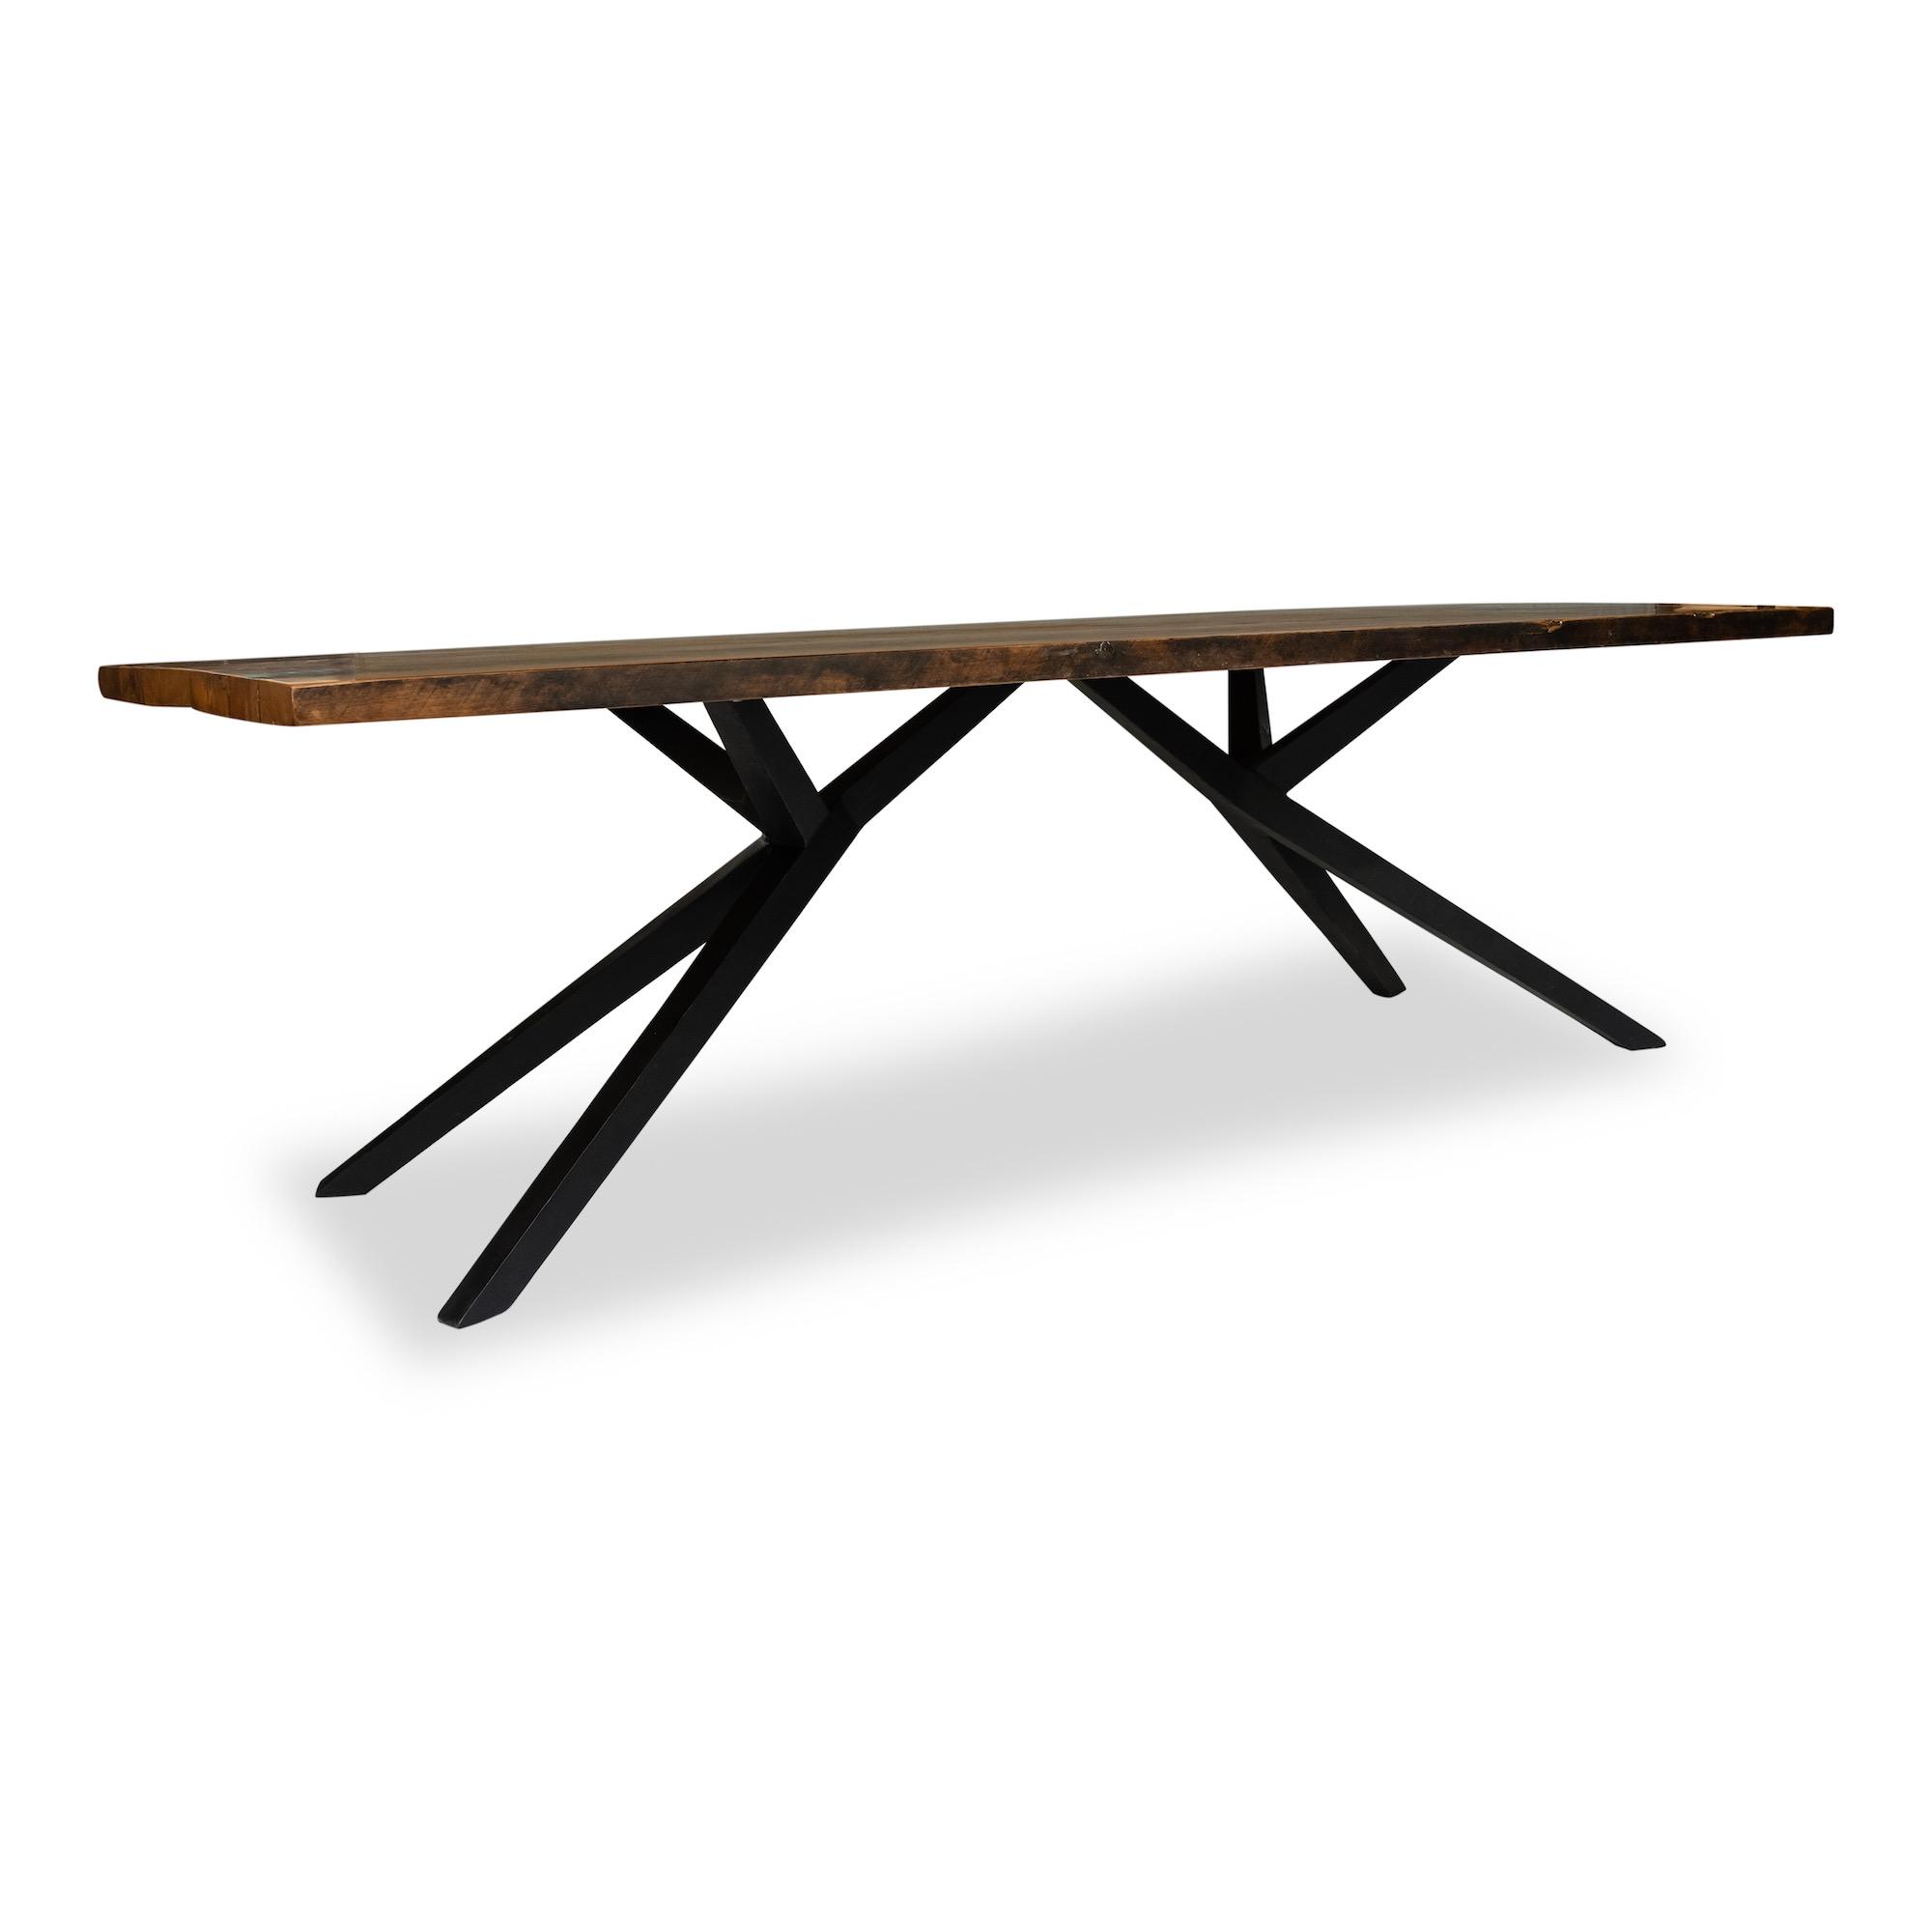 Woodcraft_Furniture_ScorpoTable-4-1.jpeg